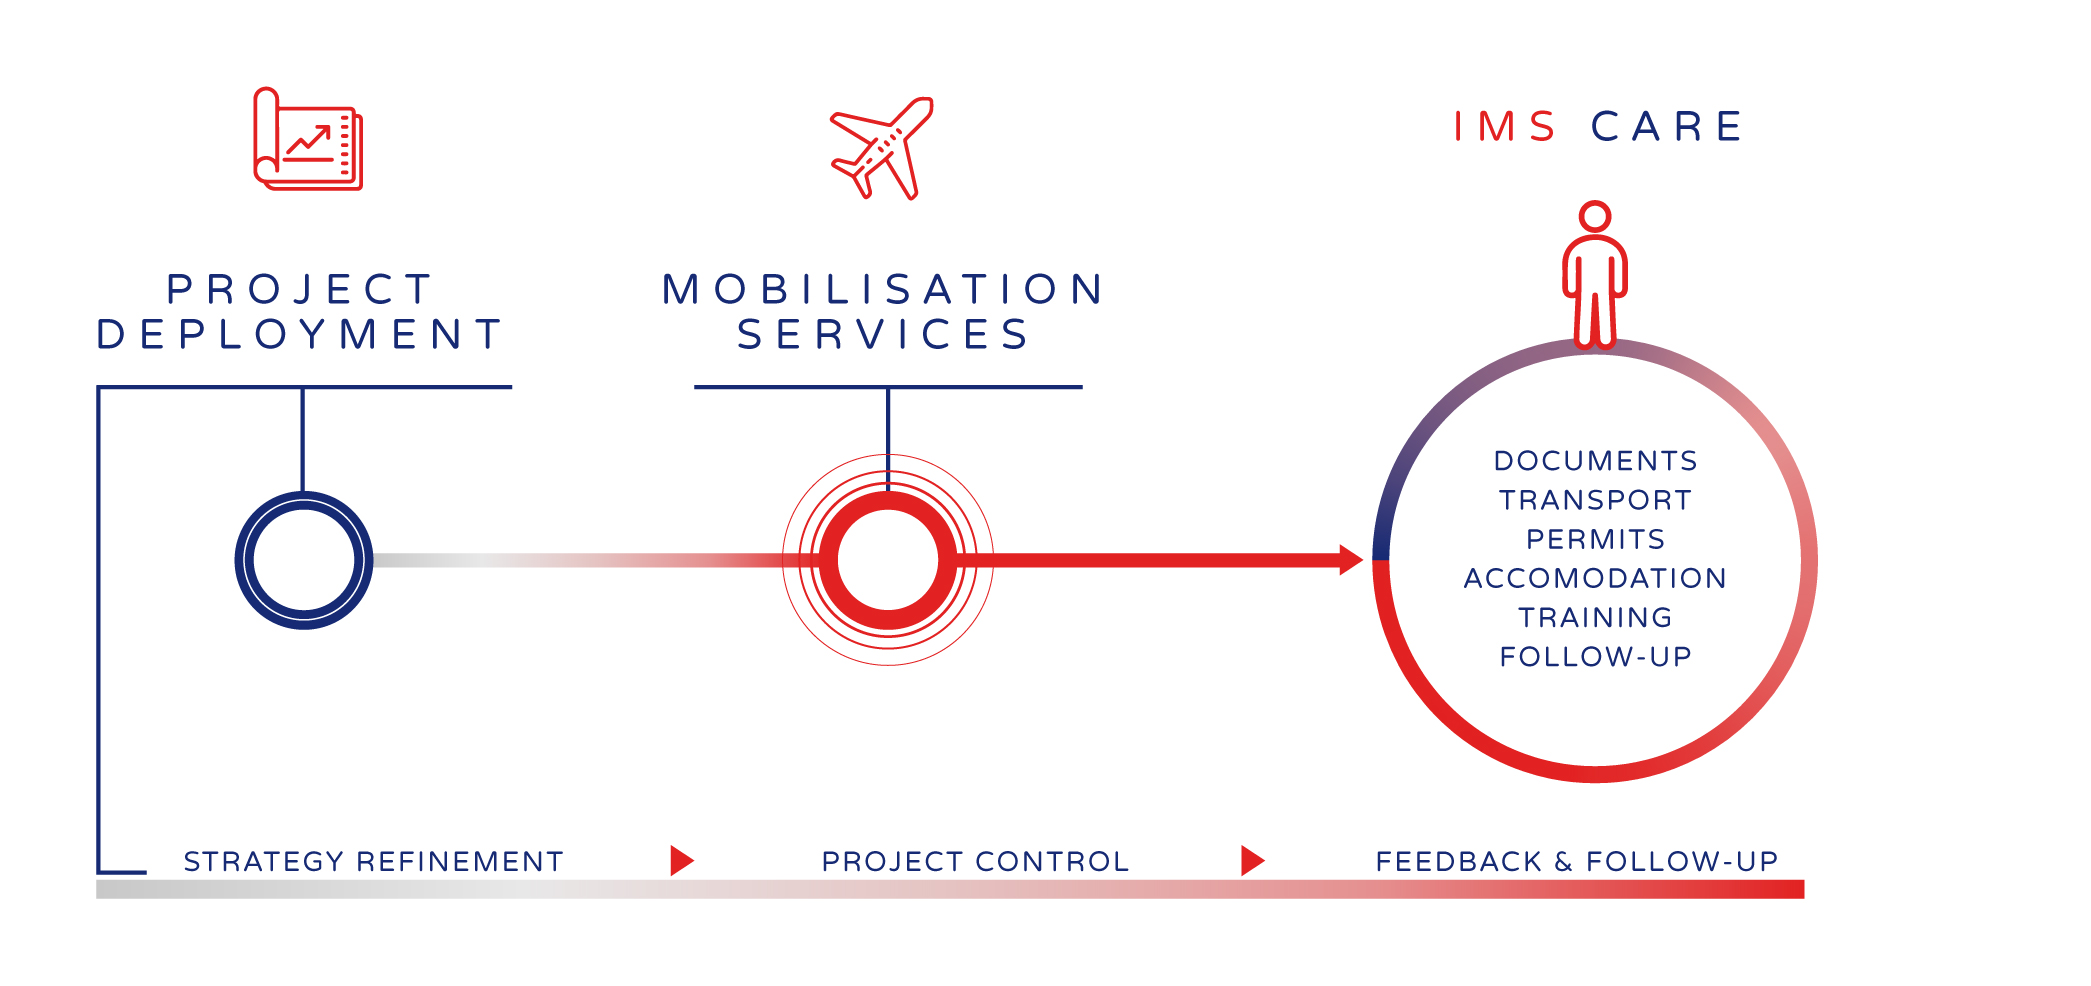 IMS mobilisation